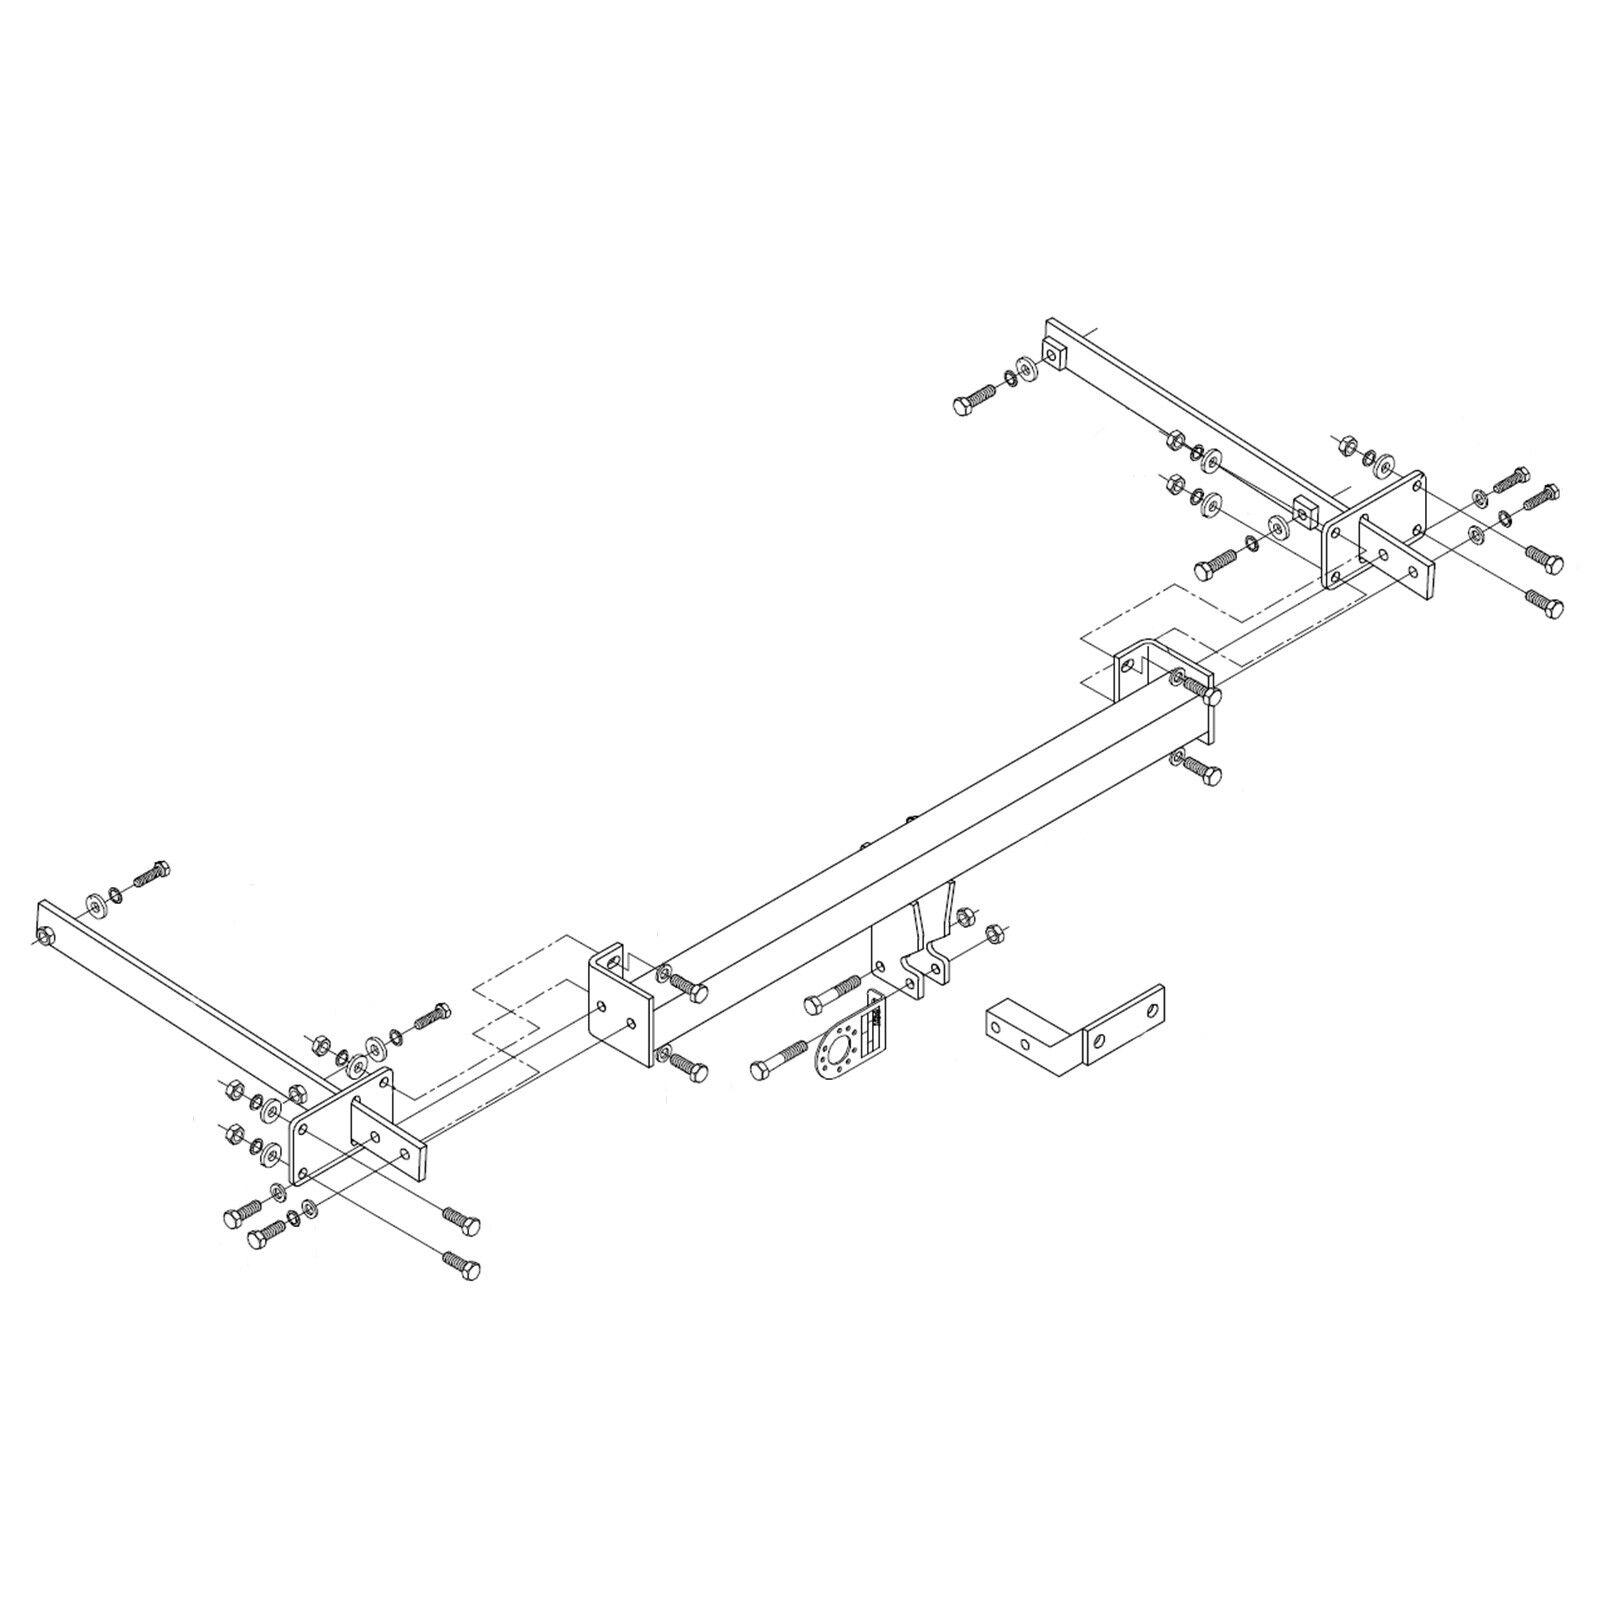 Detachable Vertical Towbar for MERCEDES C-CLASS 2007-2014 S204 Estate T-model